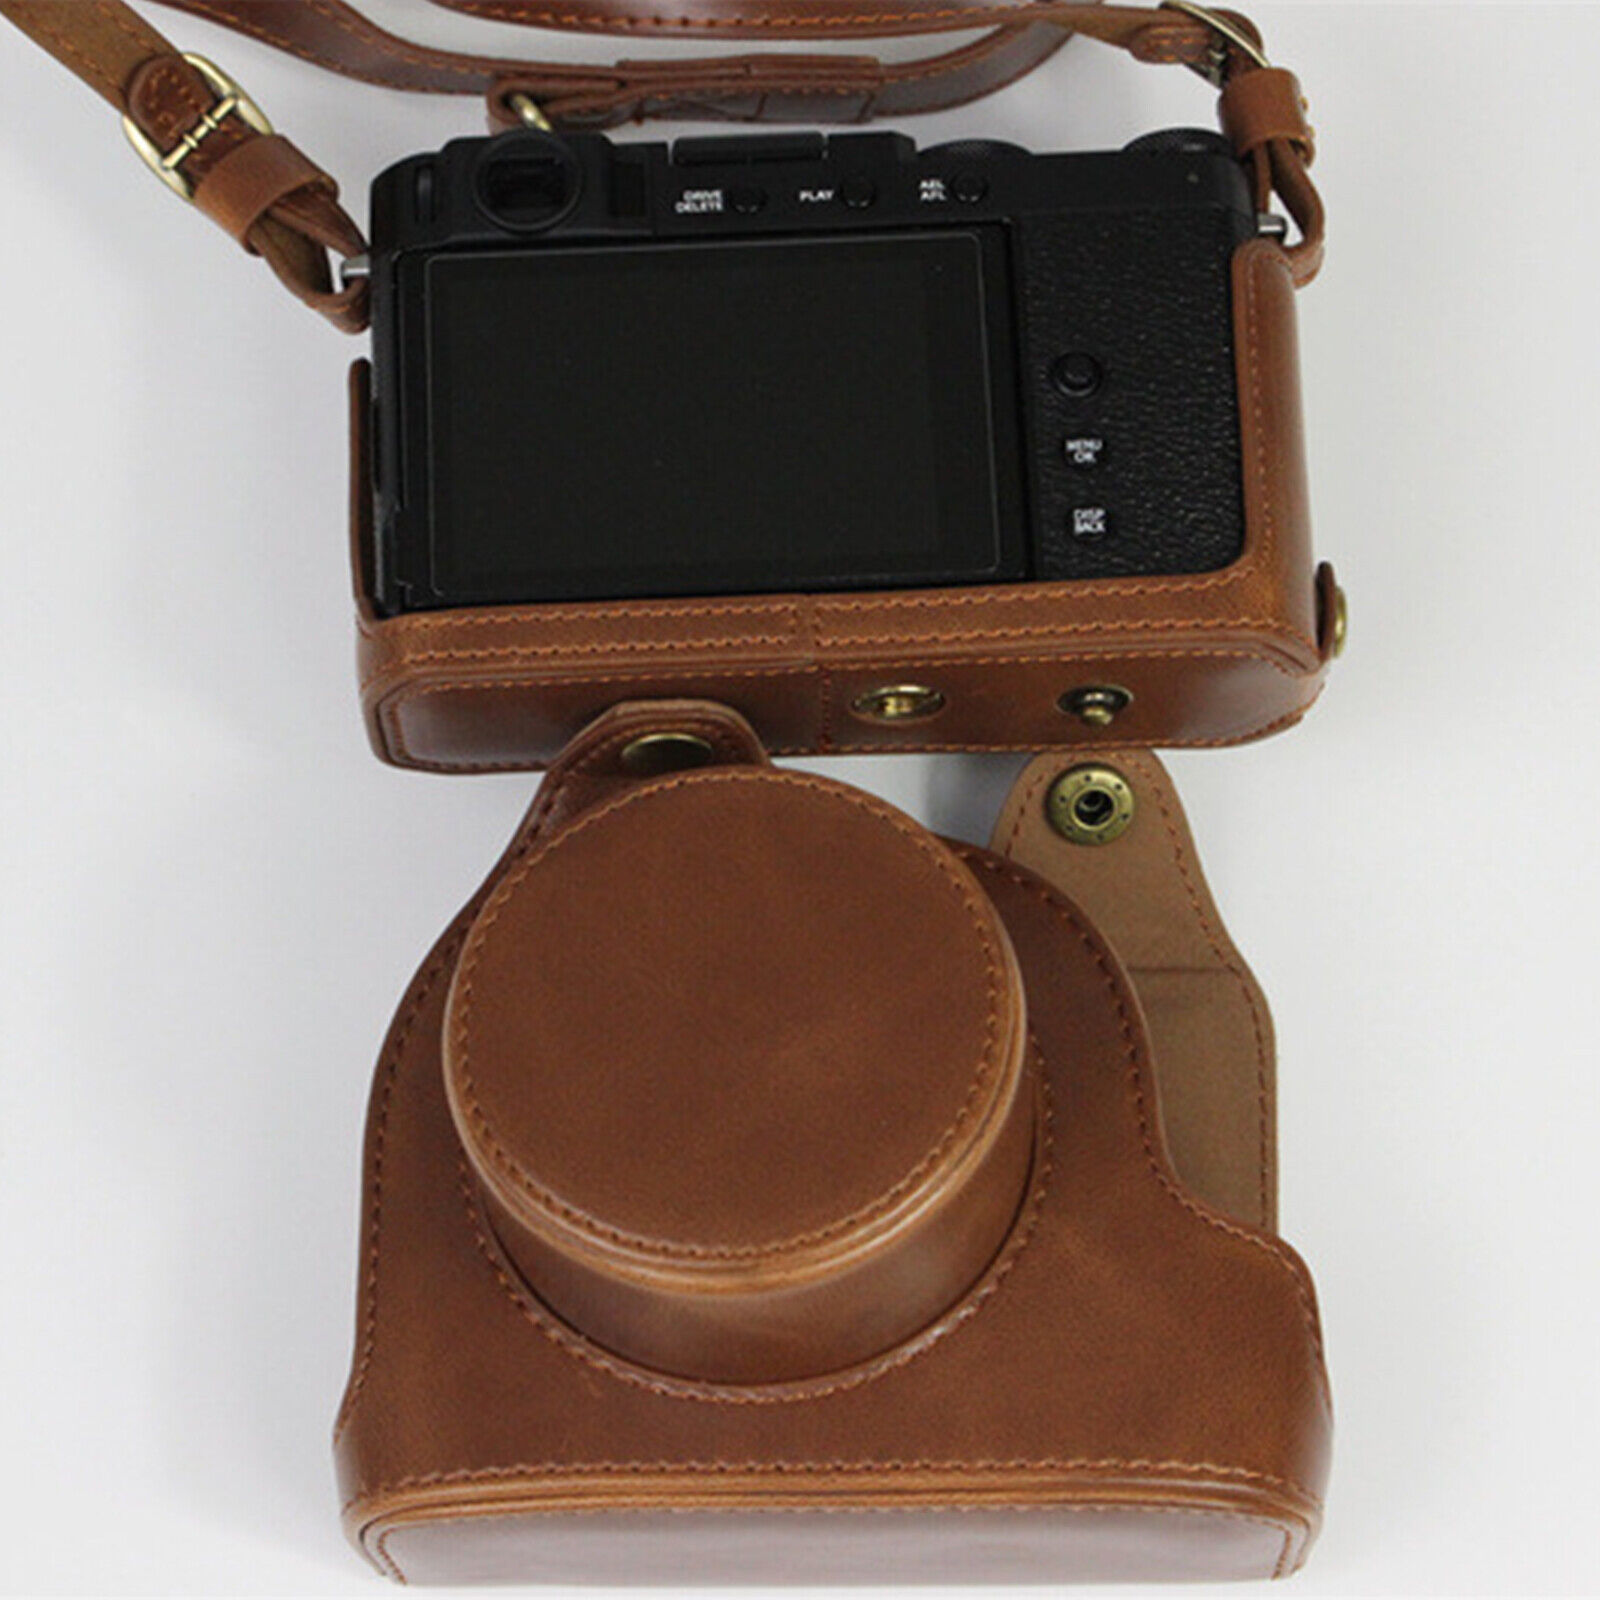 PU Leather Protective Cover Carrying Case for Fujifilm Fuji X-E4 Digital Camera